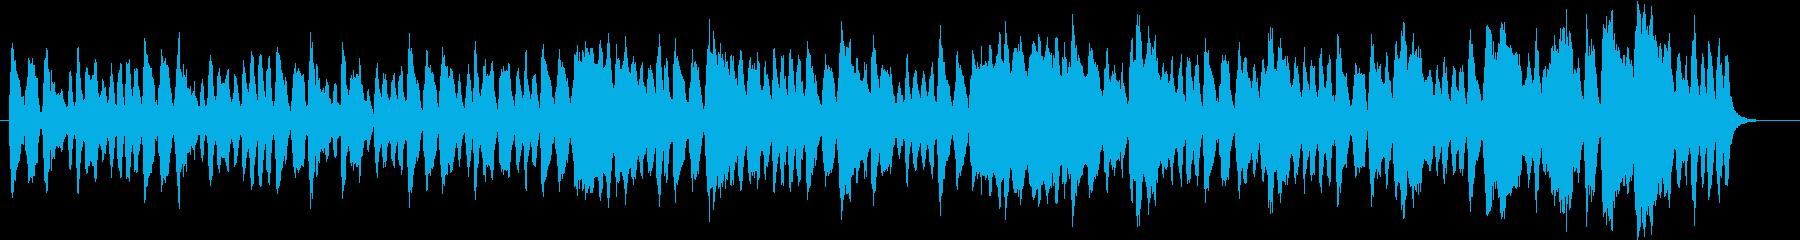 RPG オープニング(フィールド)BGMの再生済みの波形